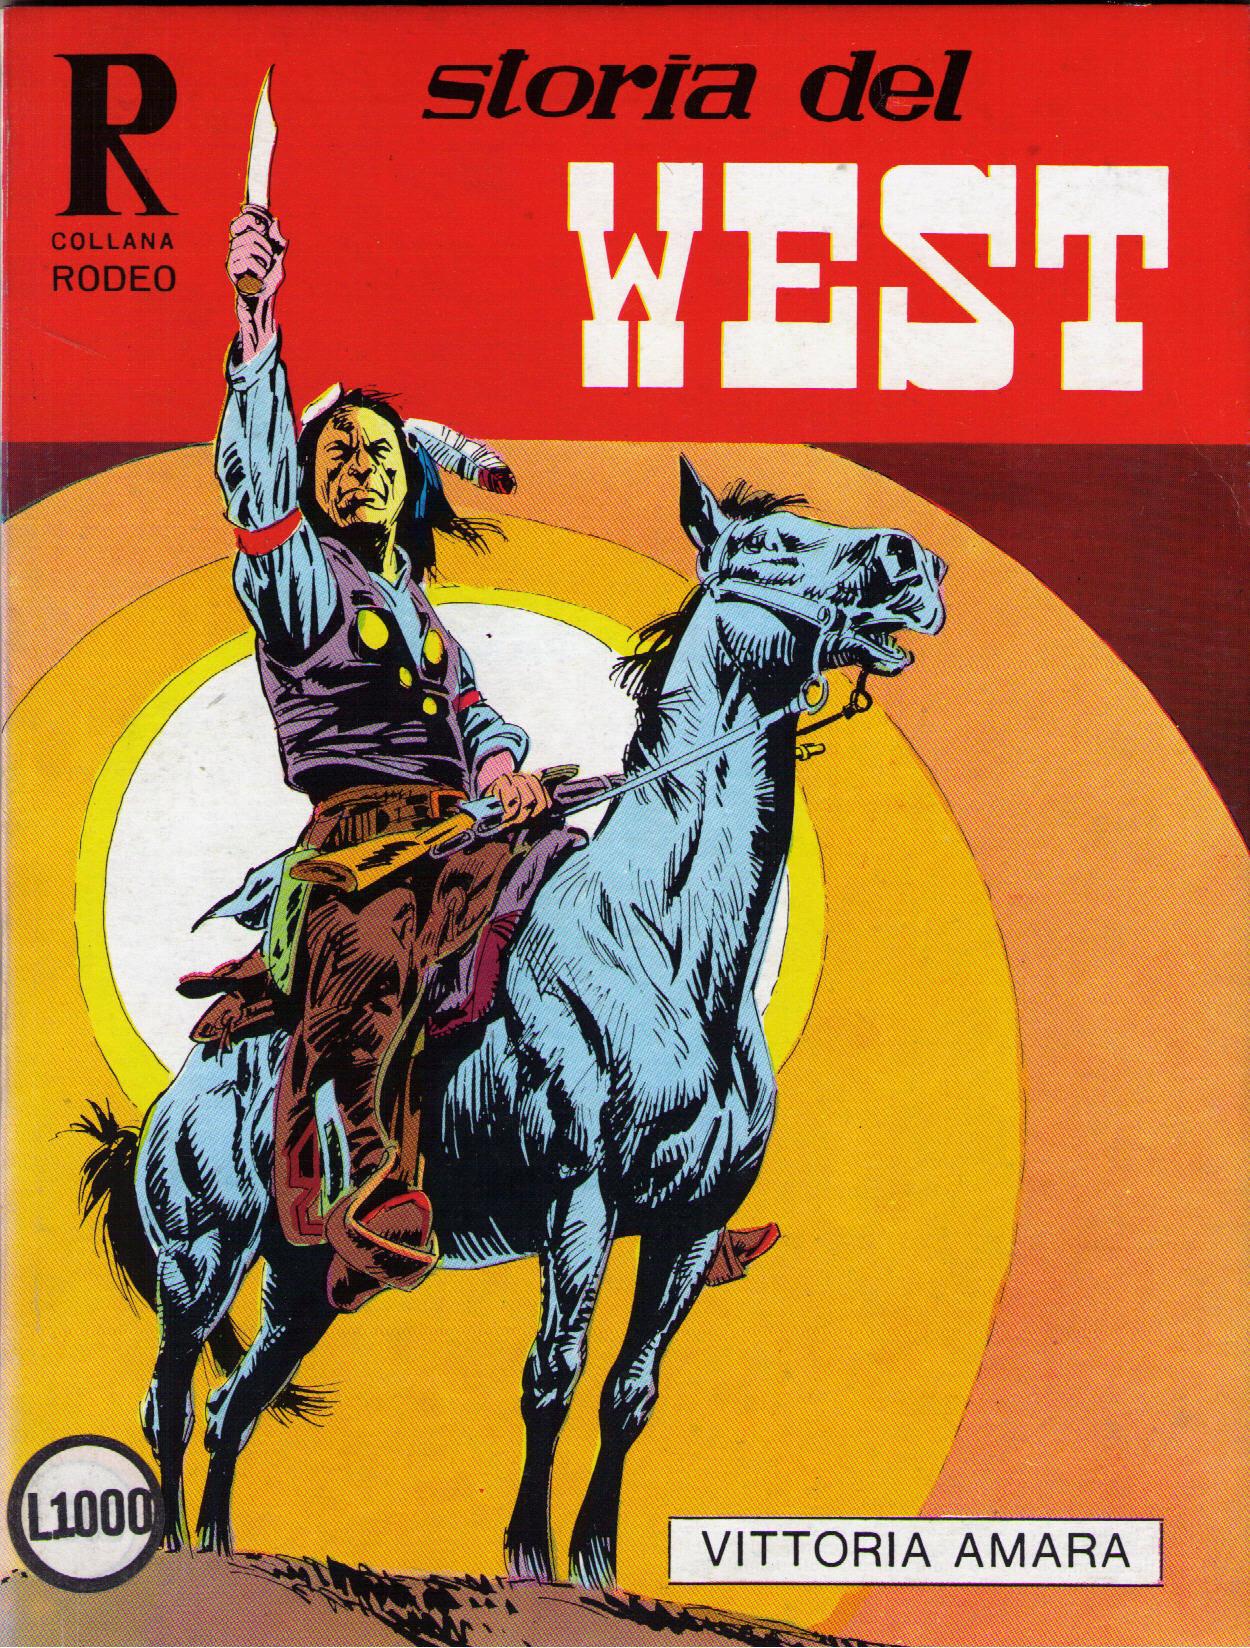 Storia del West n. 65 (Collana Rodeo n. 153)